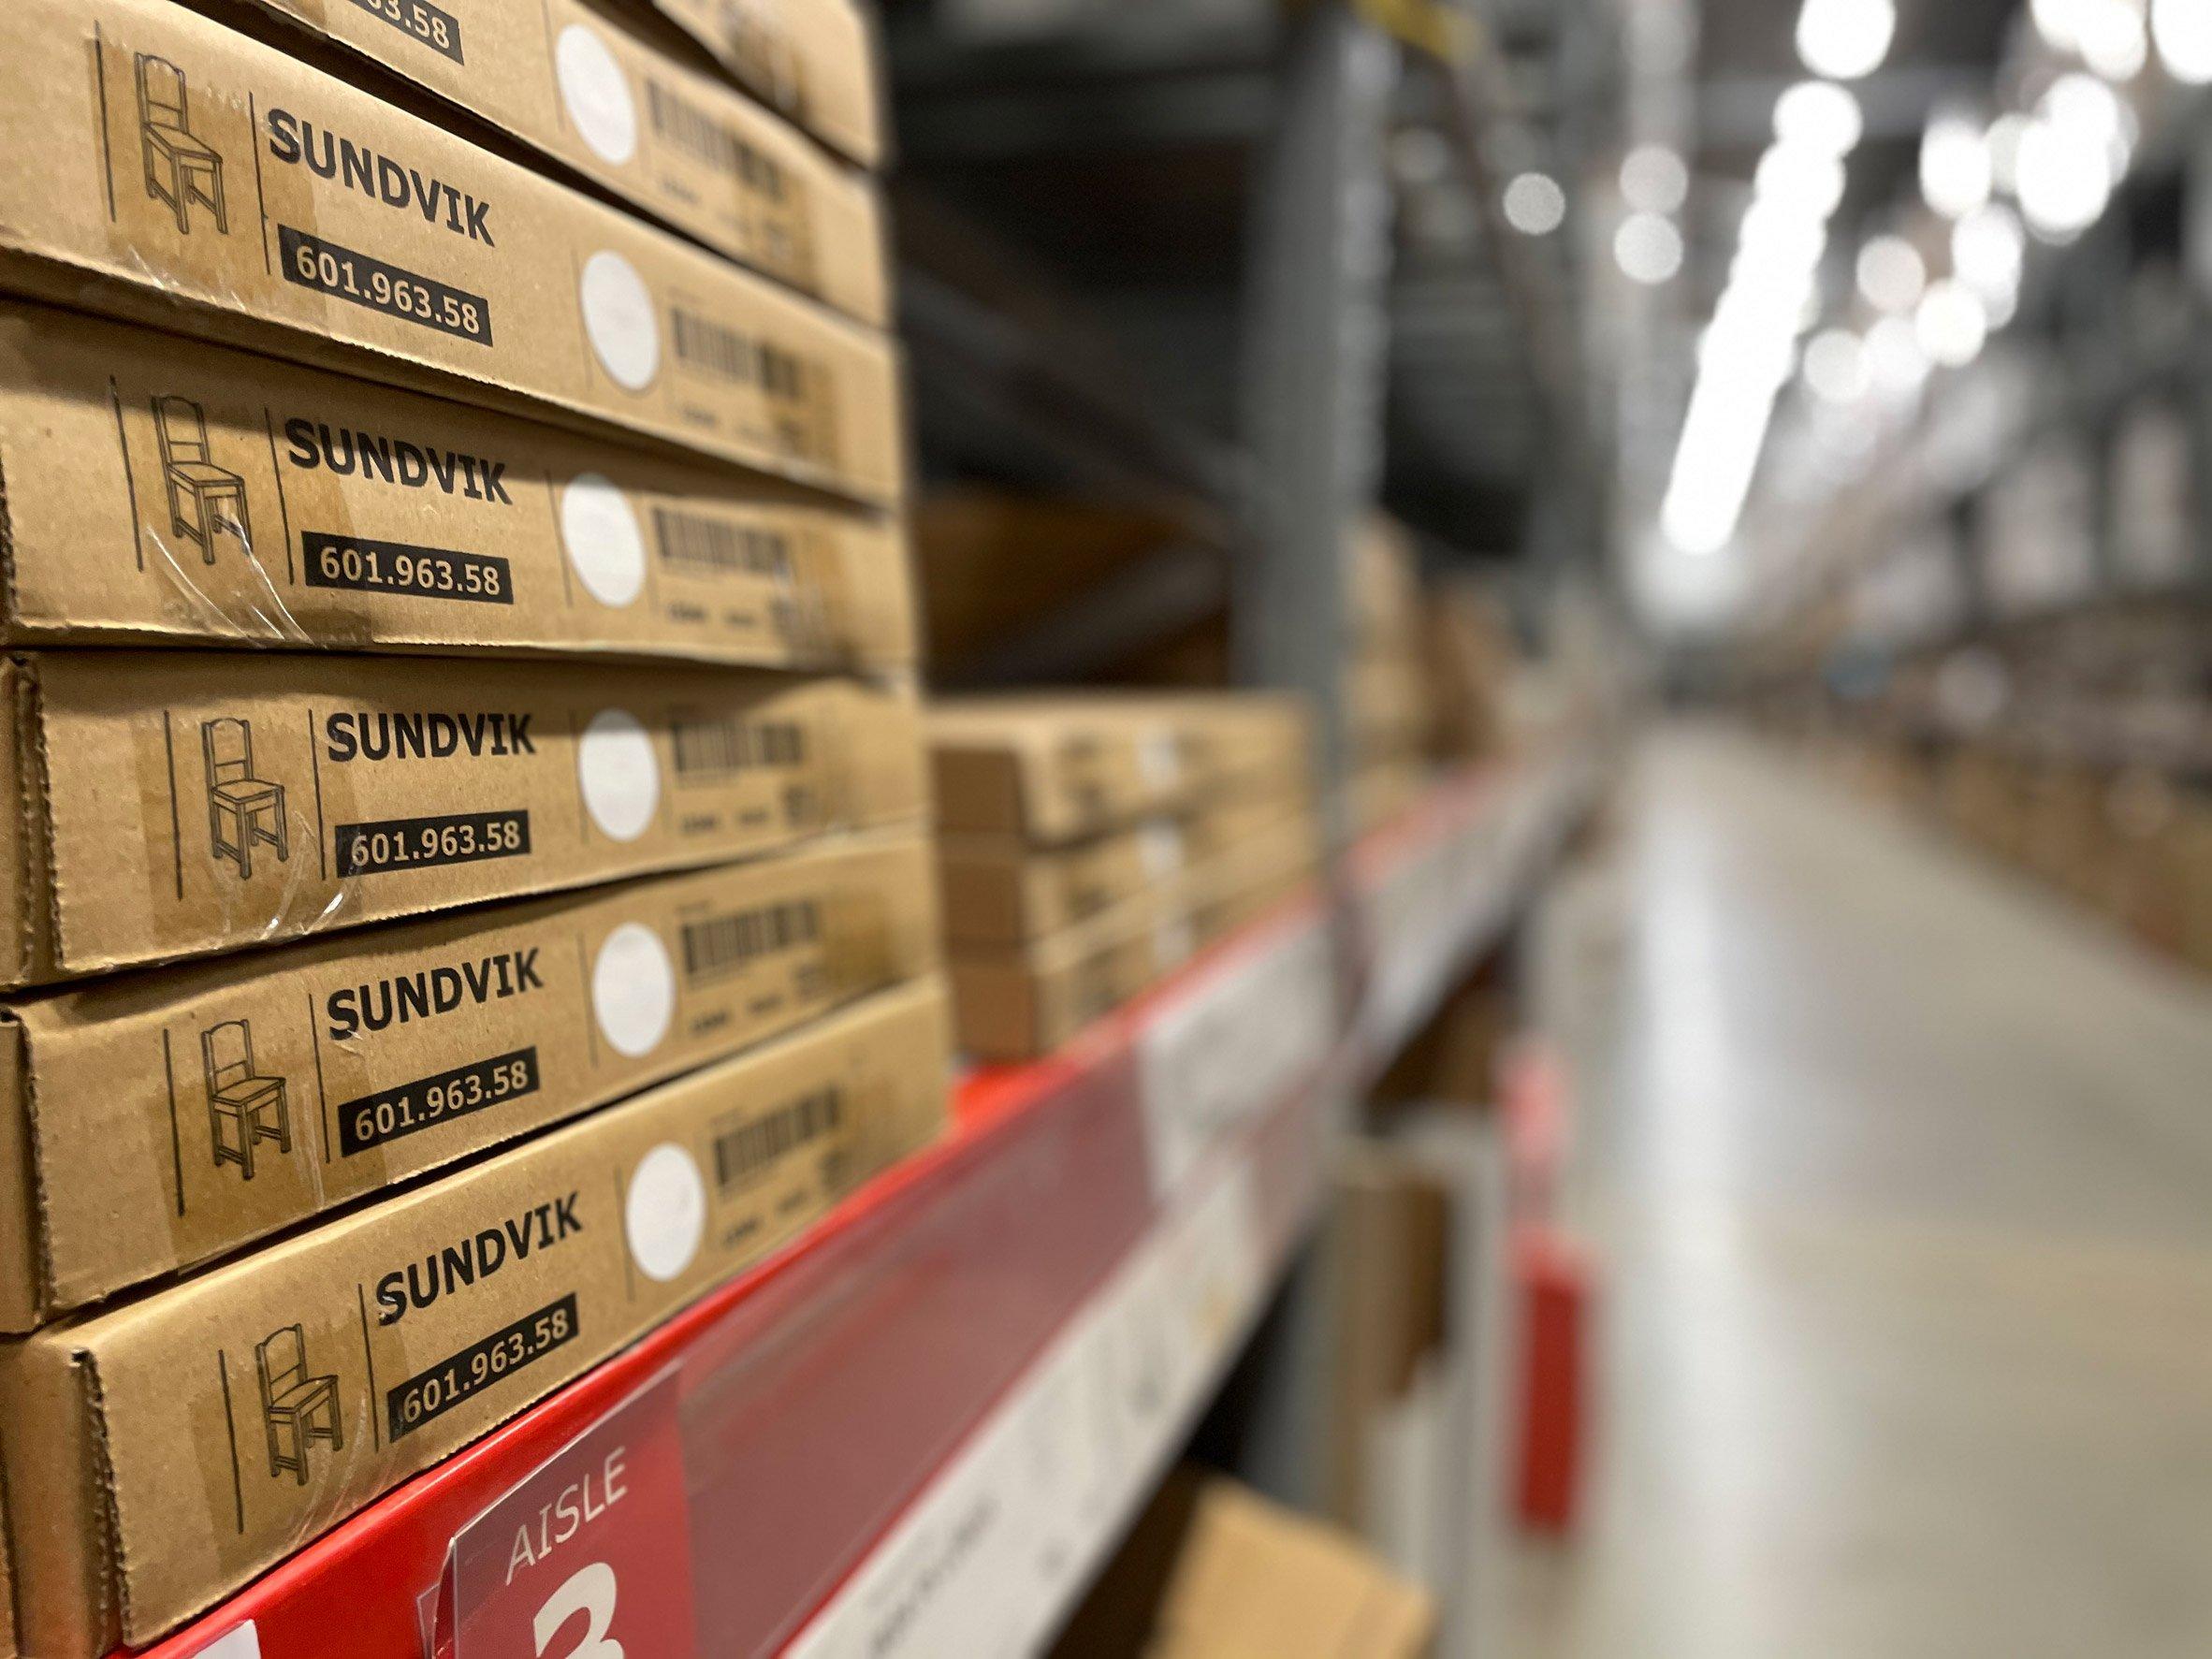 Sundvik IKEA furniture in warehouse boxes